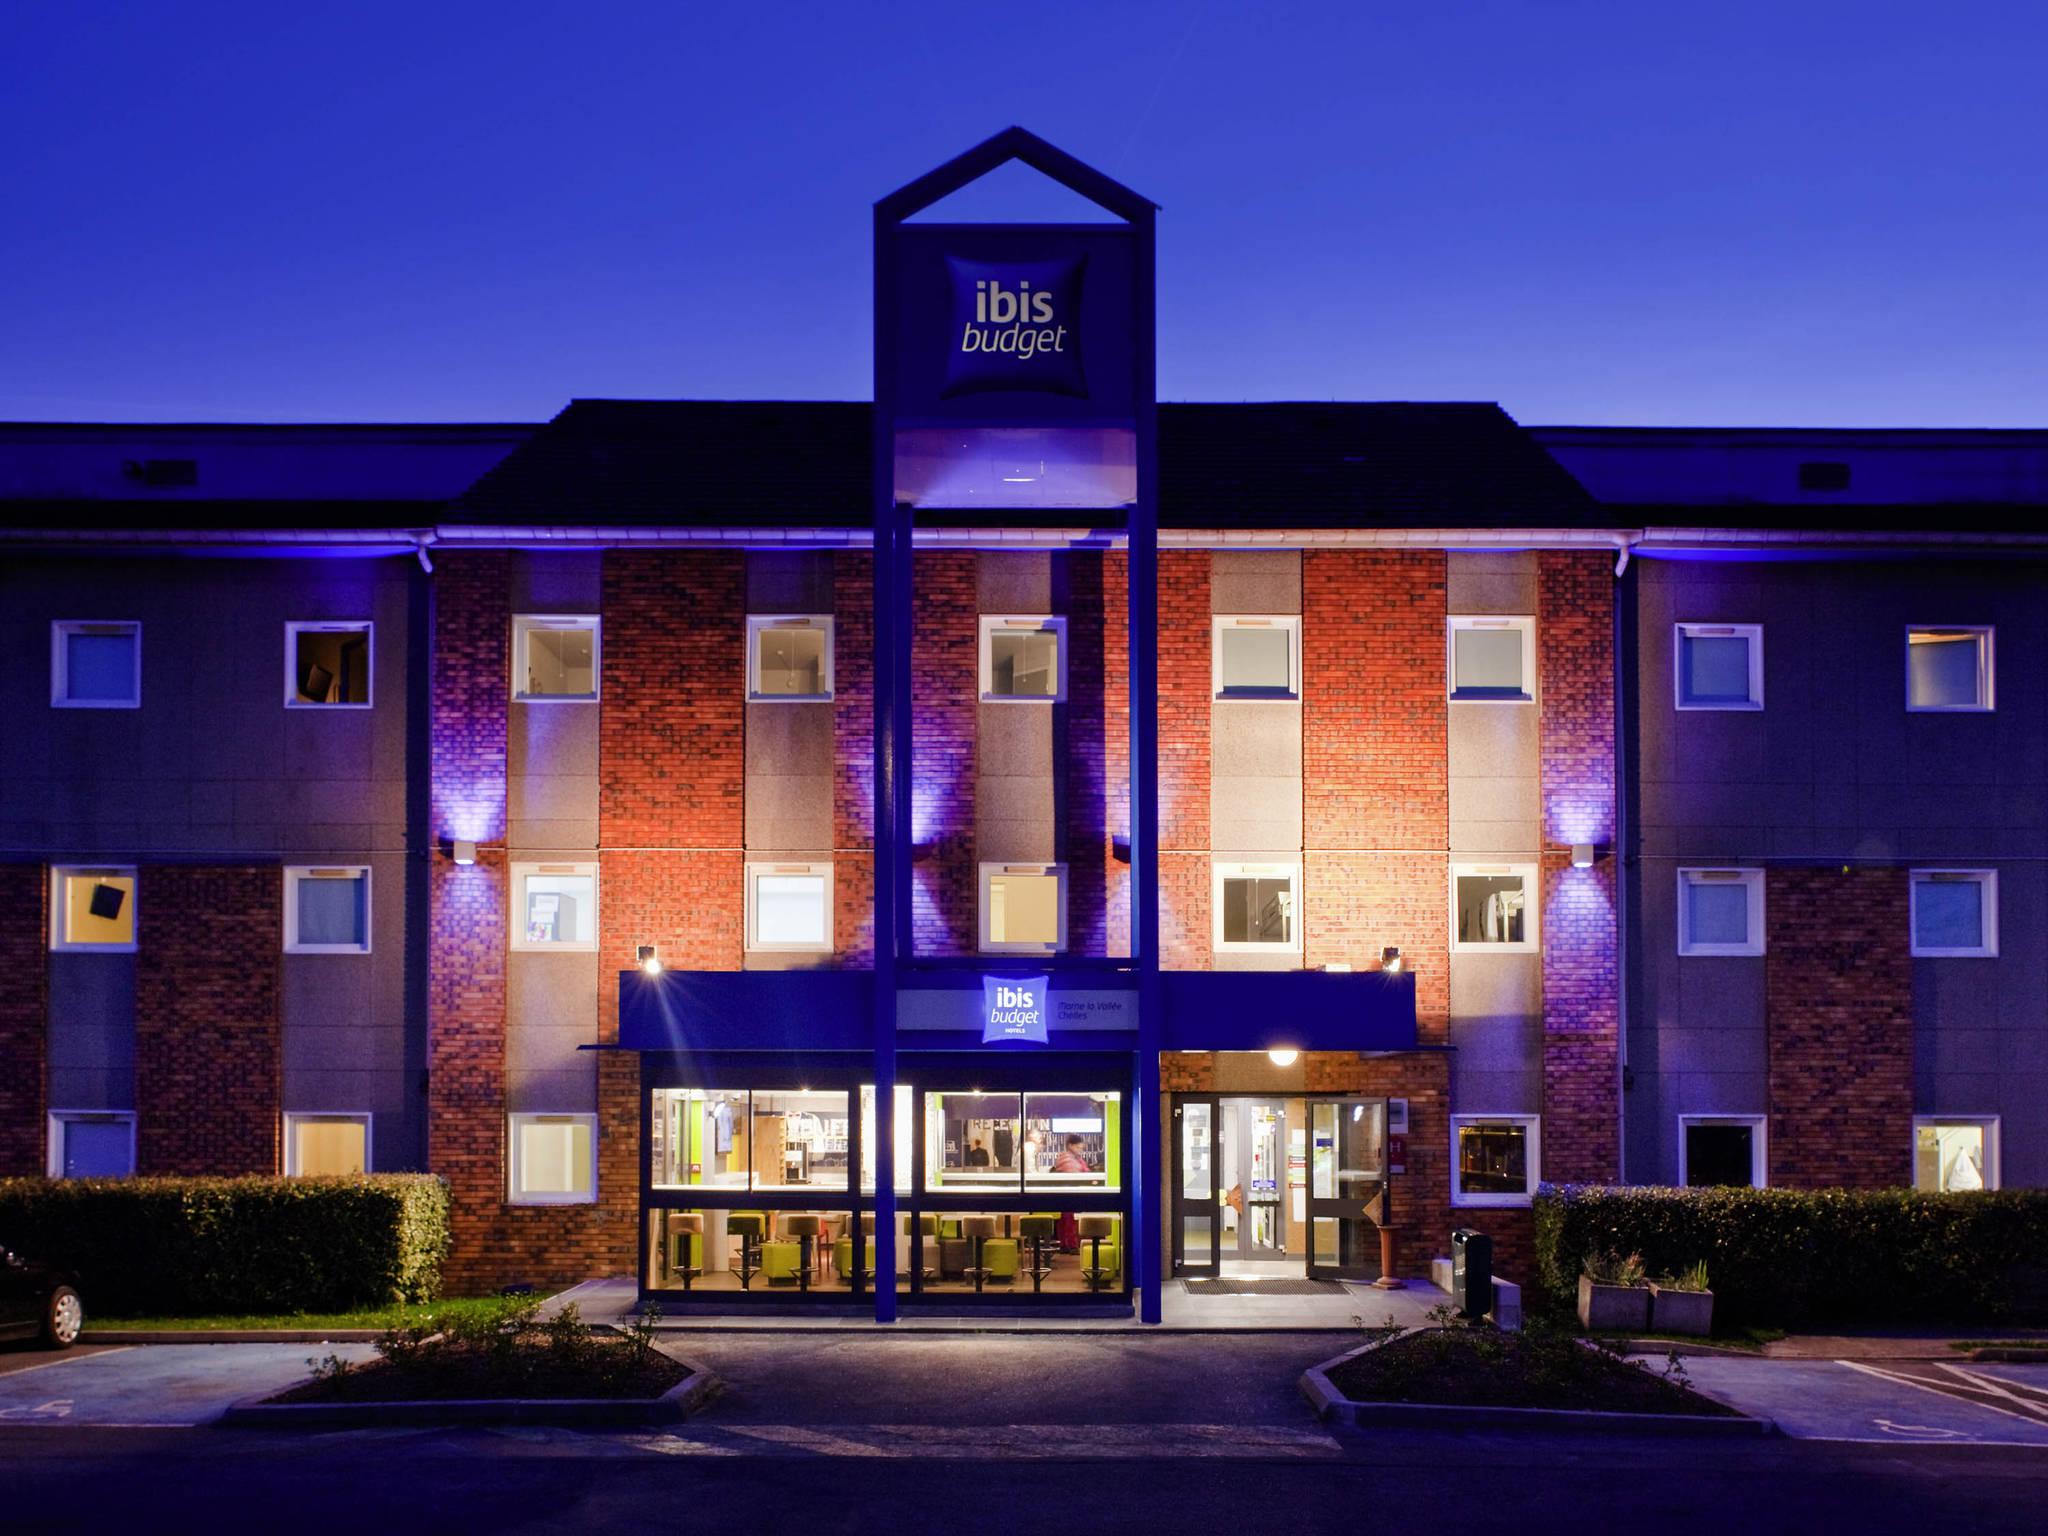 Hotel – ibis budget Marne-la-Vallée Chelles